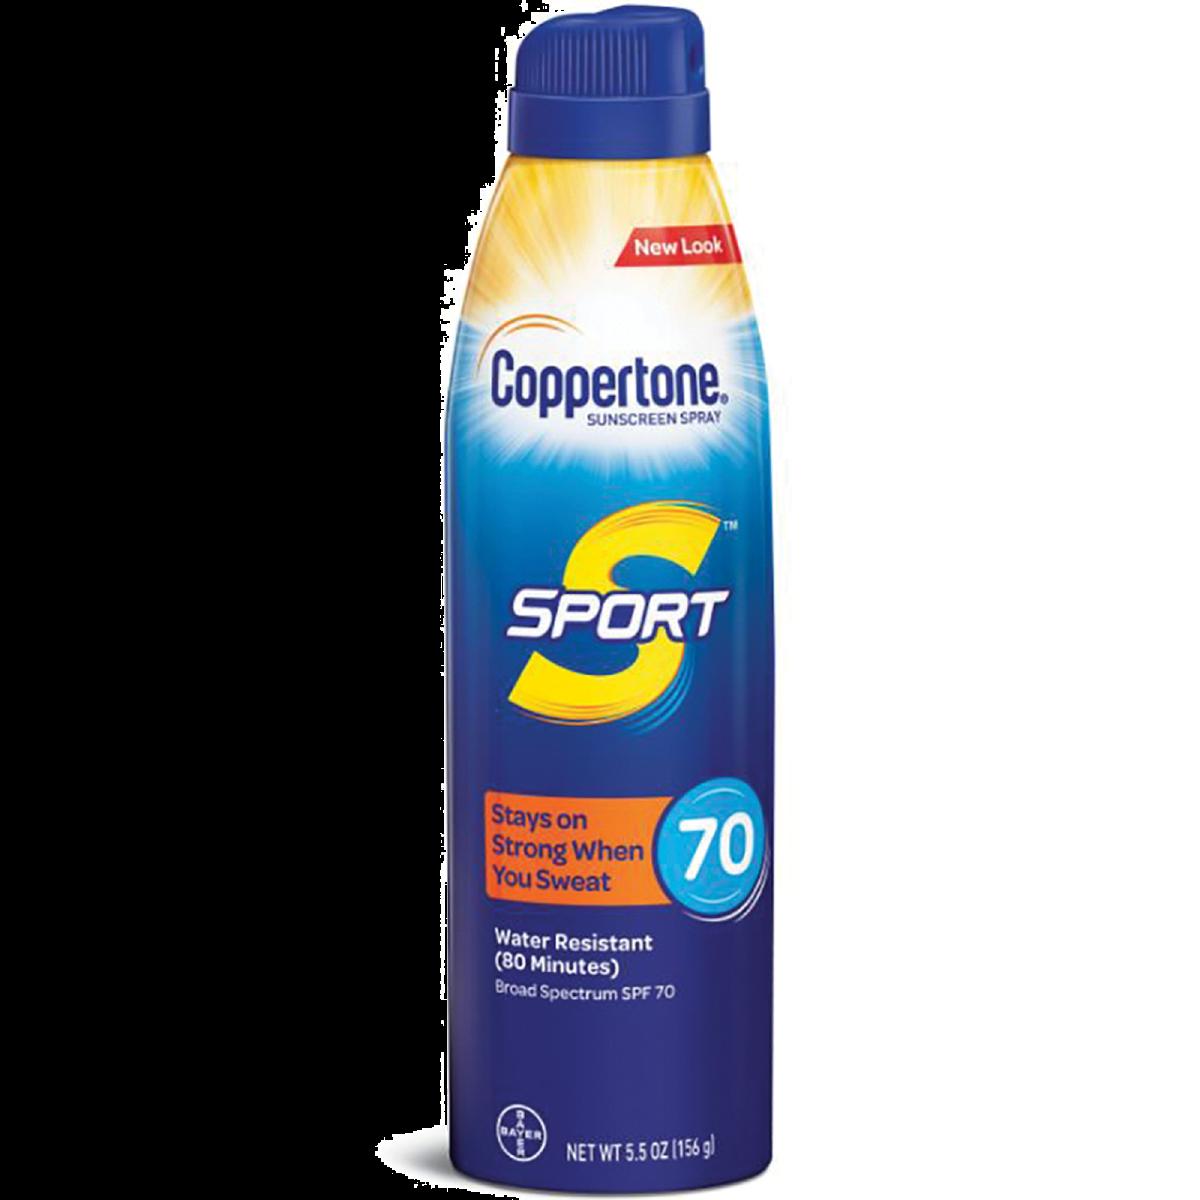 Coppertone Sport Sunscreen Continuous Spray Bottle